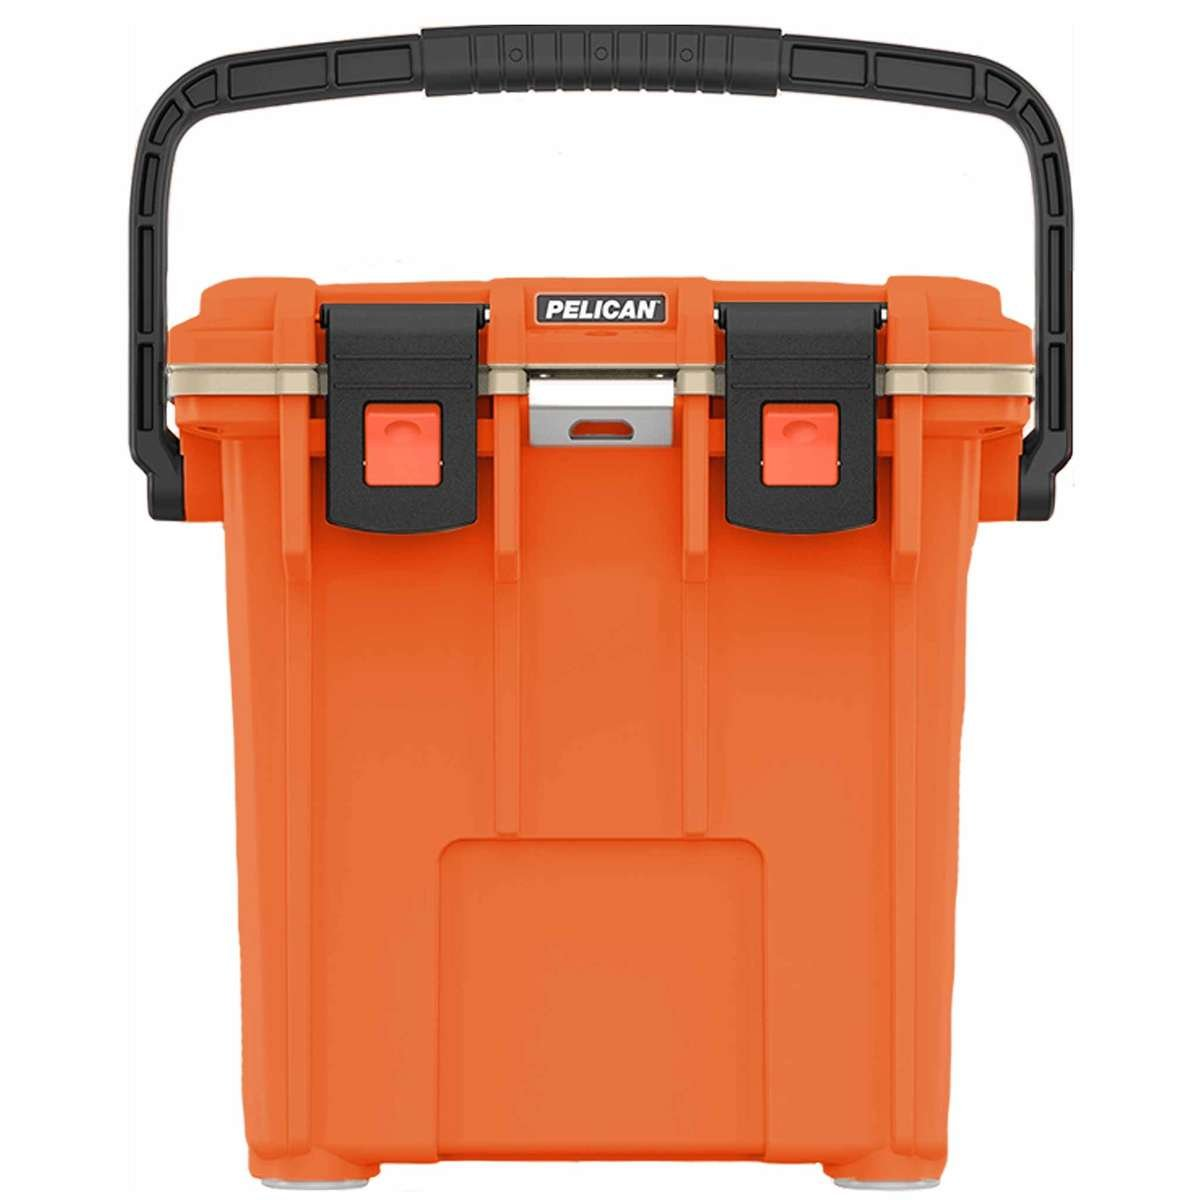 20QT Pelican Elite Cooler Orange/Tan